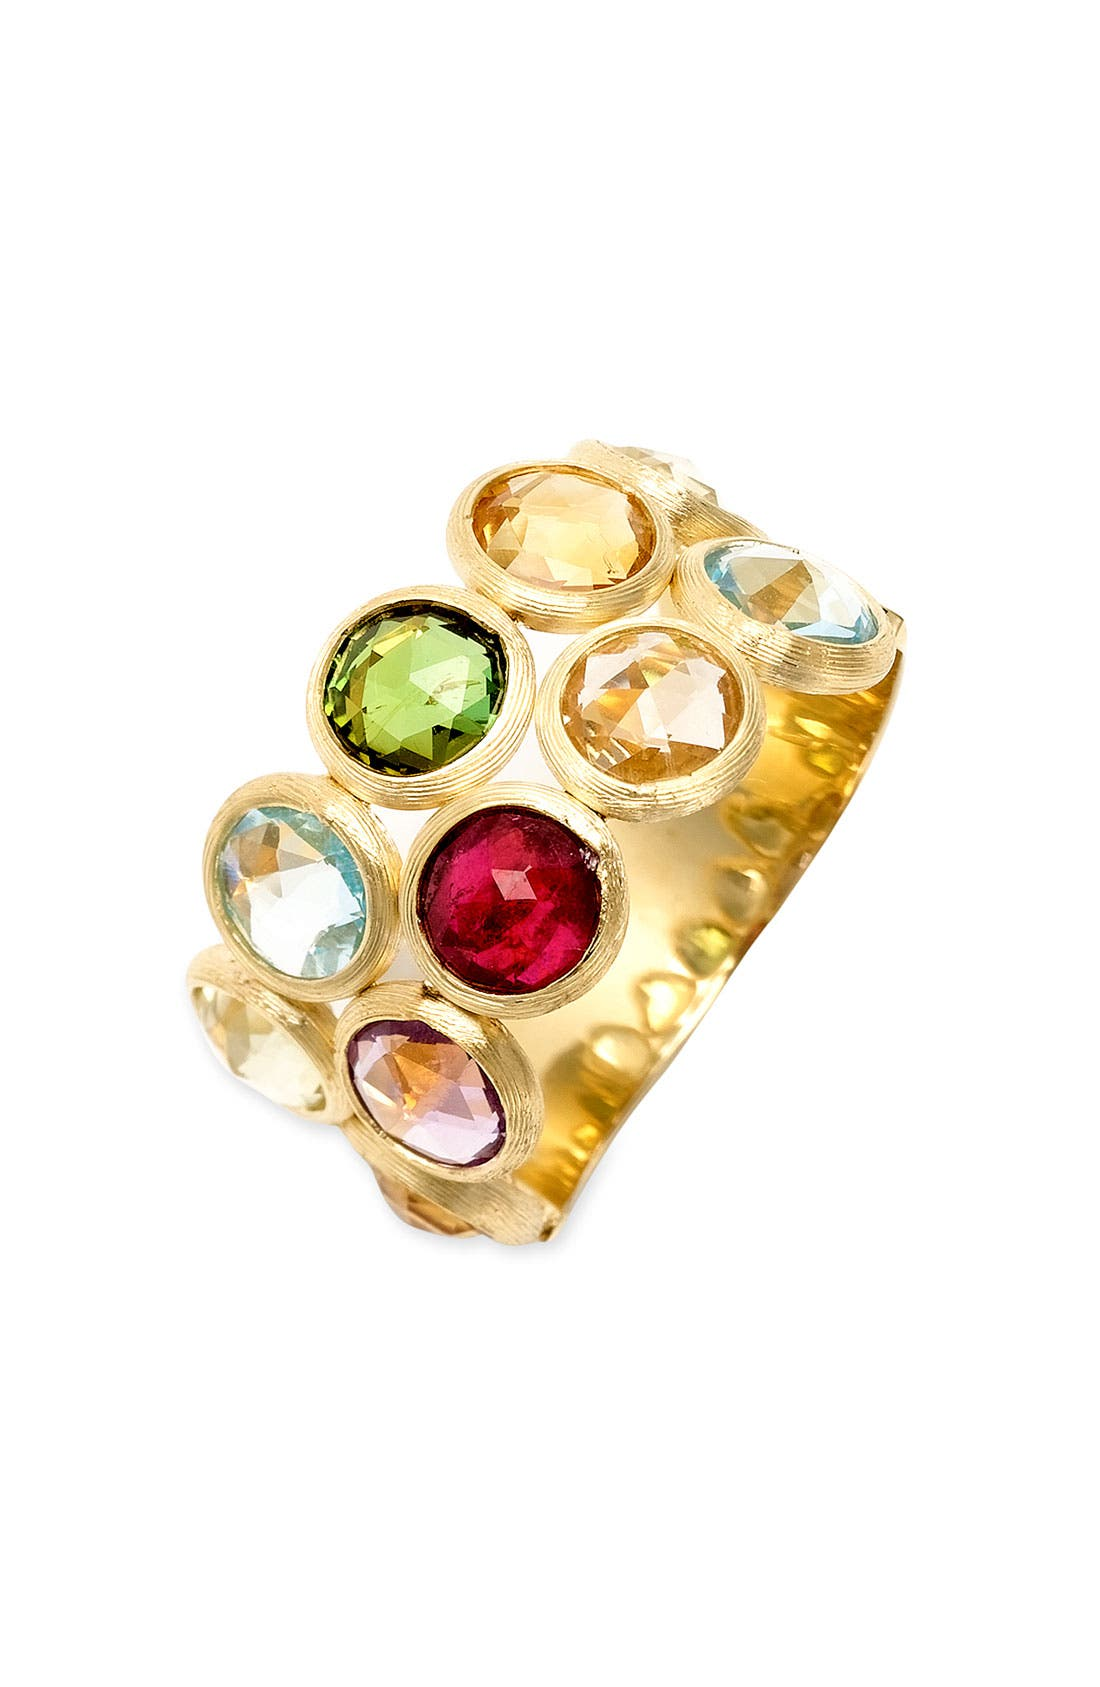 Alternate Image 1 Selected - Marco Bicego 'Mini Jaipur' Double Row Semiprecious Stone Ring